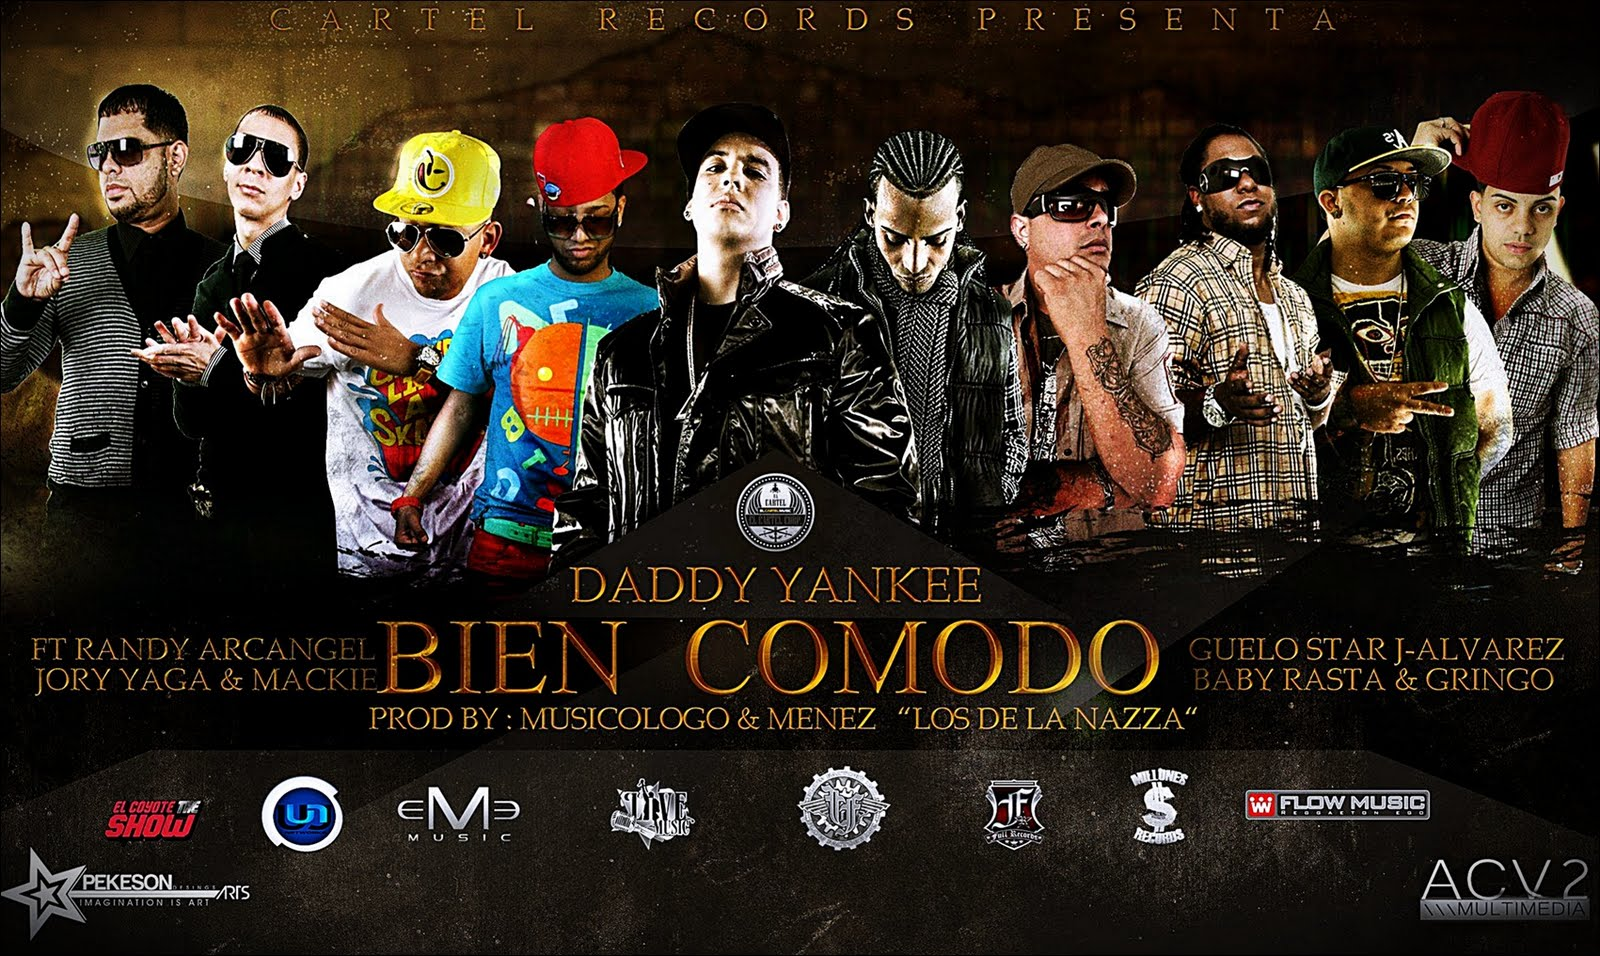 http://1.bp.blogspot.com/-PhK5Q-tH0xY/ThHwiAYcdXI/AAAAAAAAAxg/CFGKAXm89pQ/s1600/Daddy+Yankee+Feat.+Arcangel%252C+J+Alvarez%252C+Randy%252C+Guelo+Star%252C+Yaga+Y+Mackie%252C+Baby+Rasta+Y+Gringo+Y+Jory+%25E2%2580%2593+Bien+Comodo+%2528Prod.+Musicologo+%2526+Menes%2529.jpg